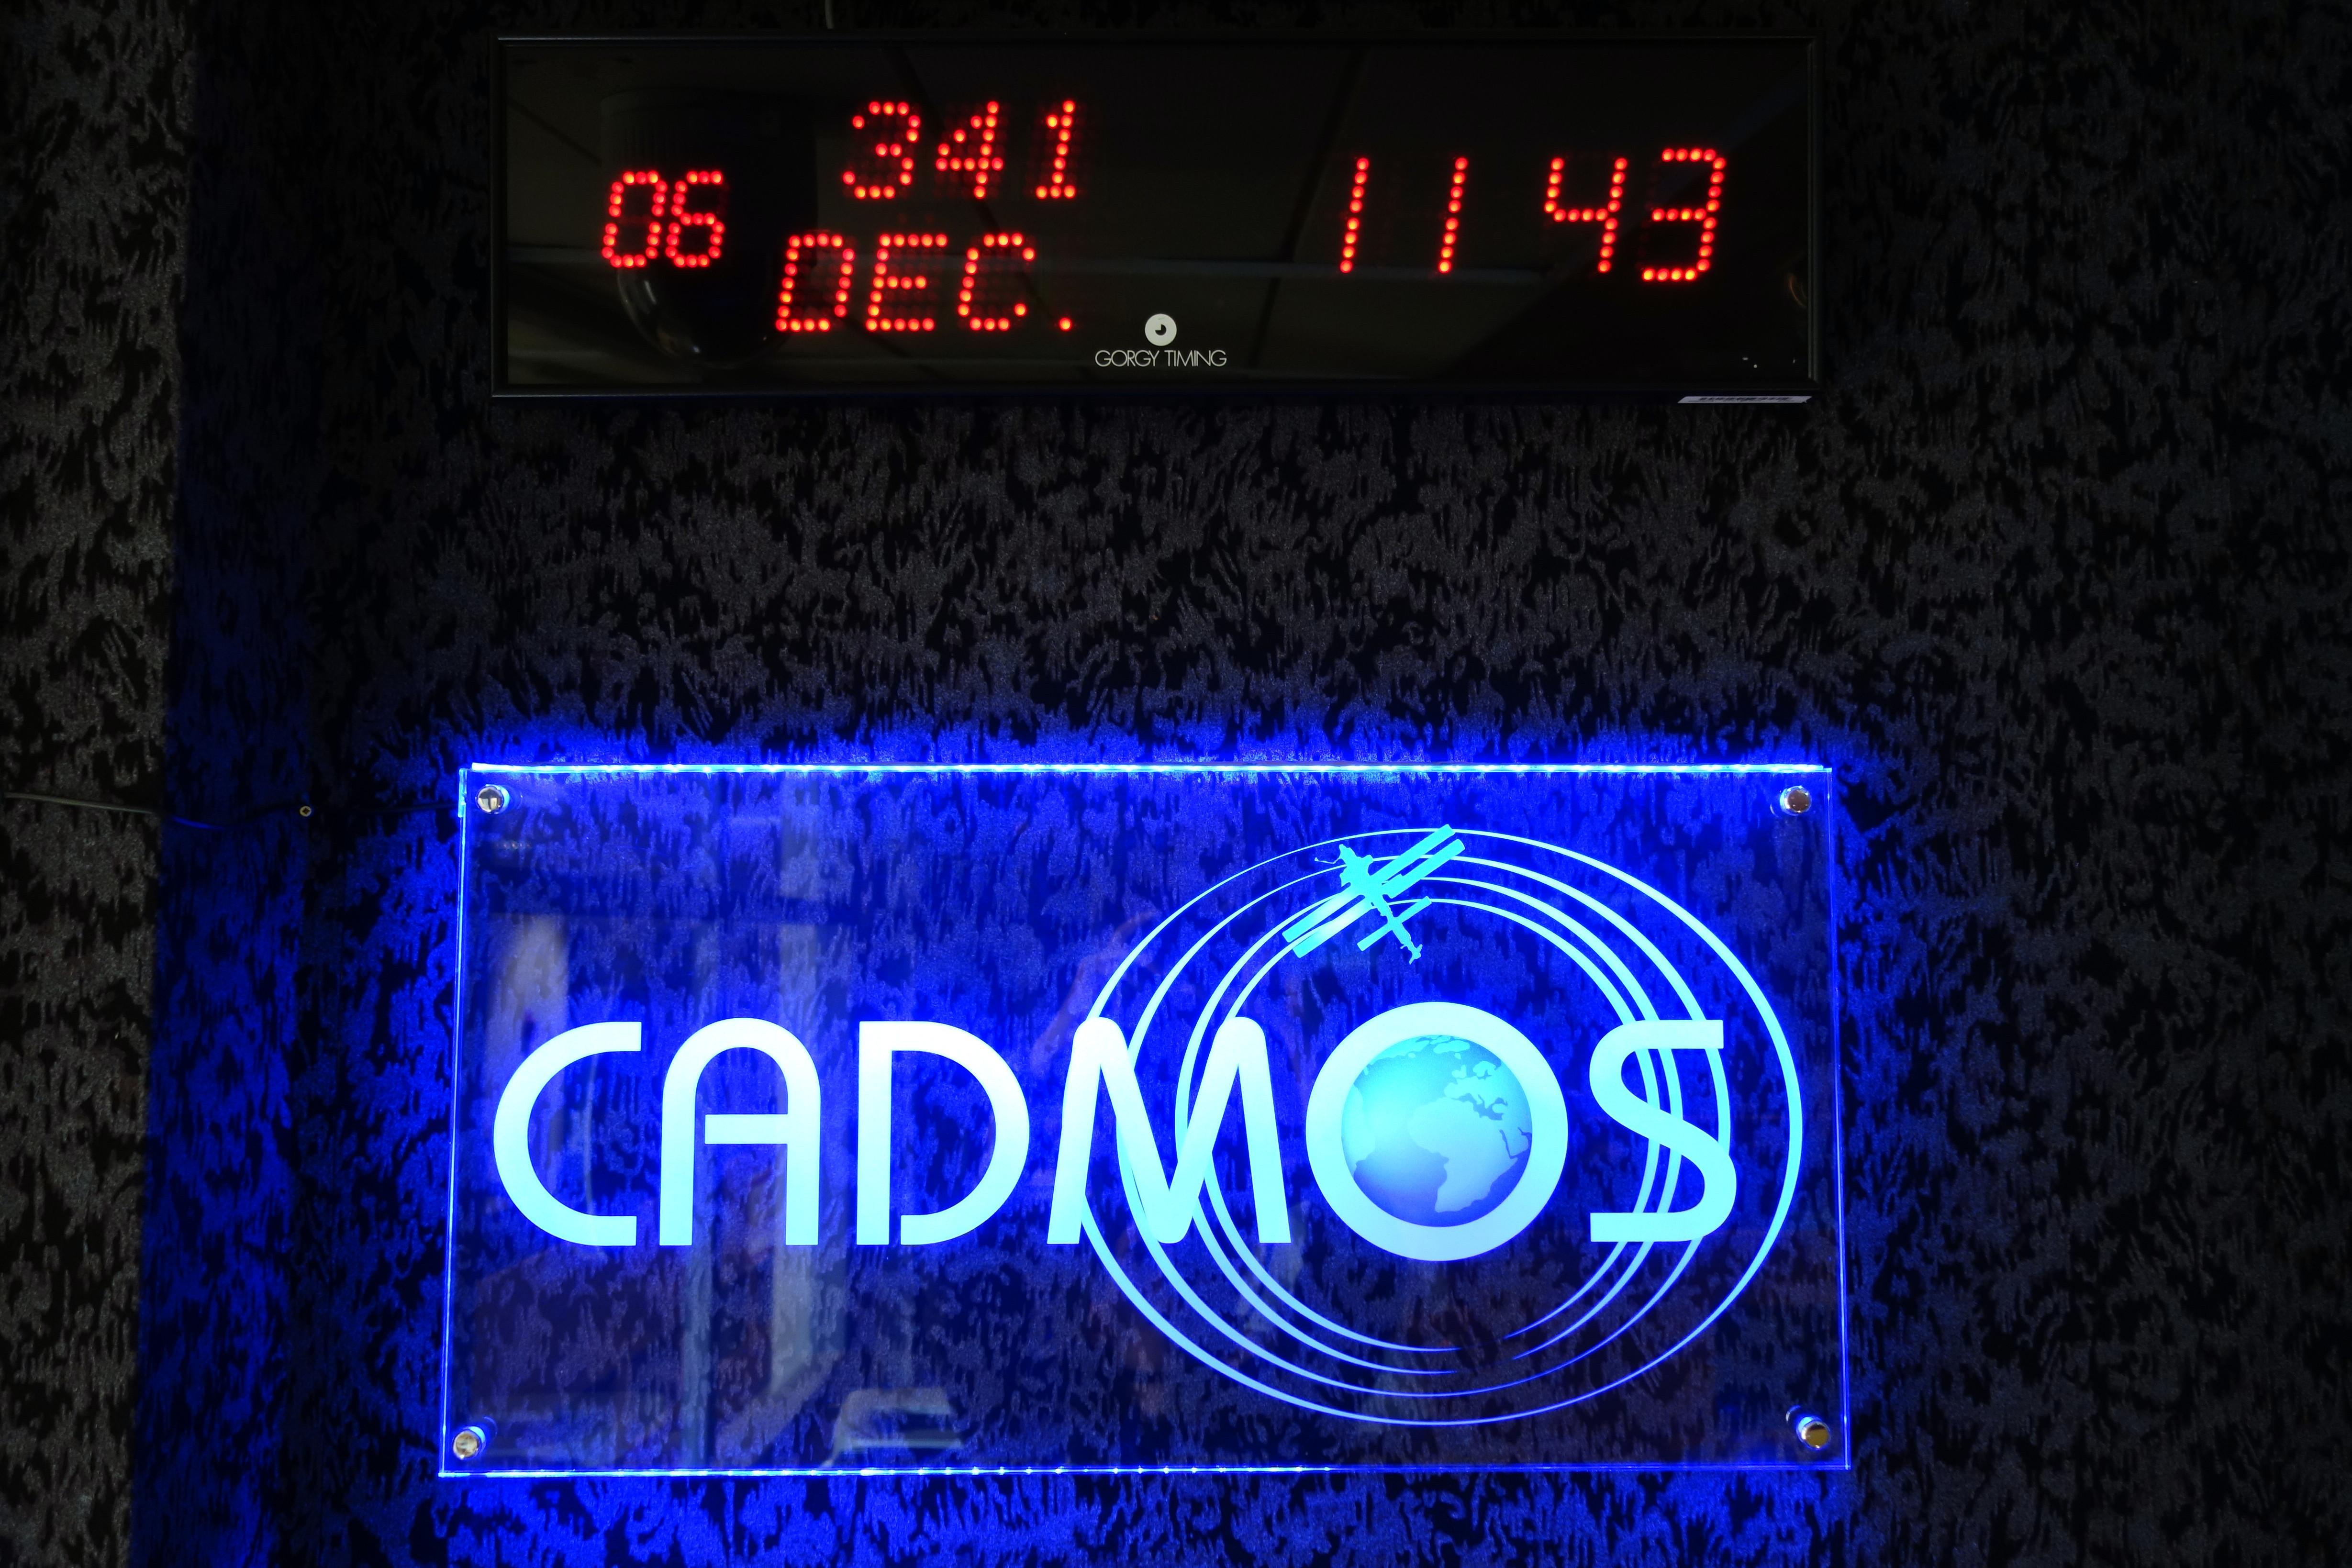 prx_cadmos-scp3-heure-gmt.jpg